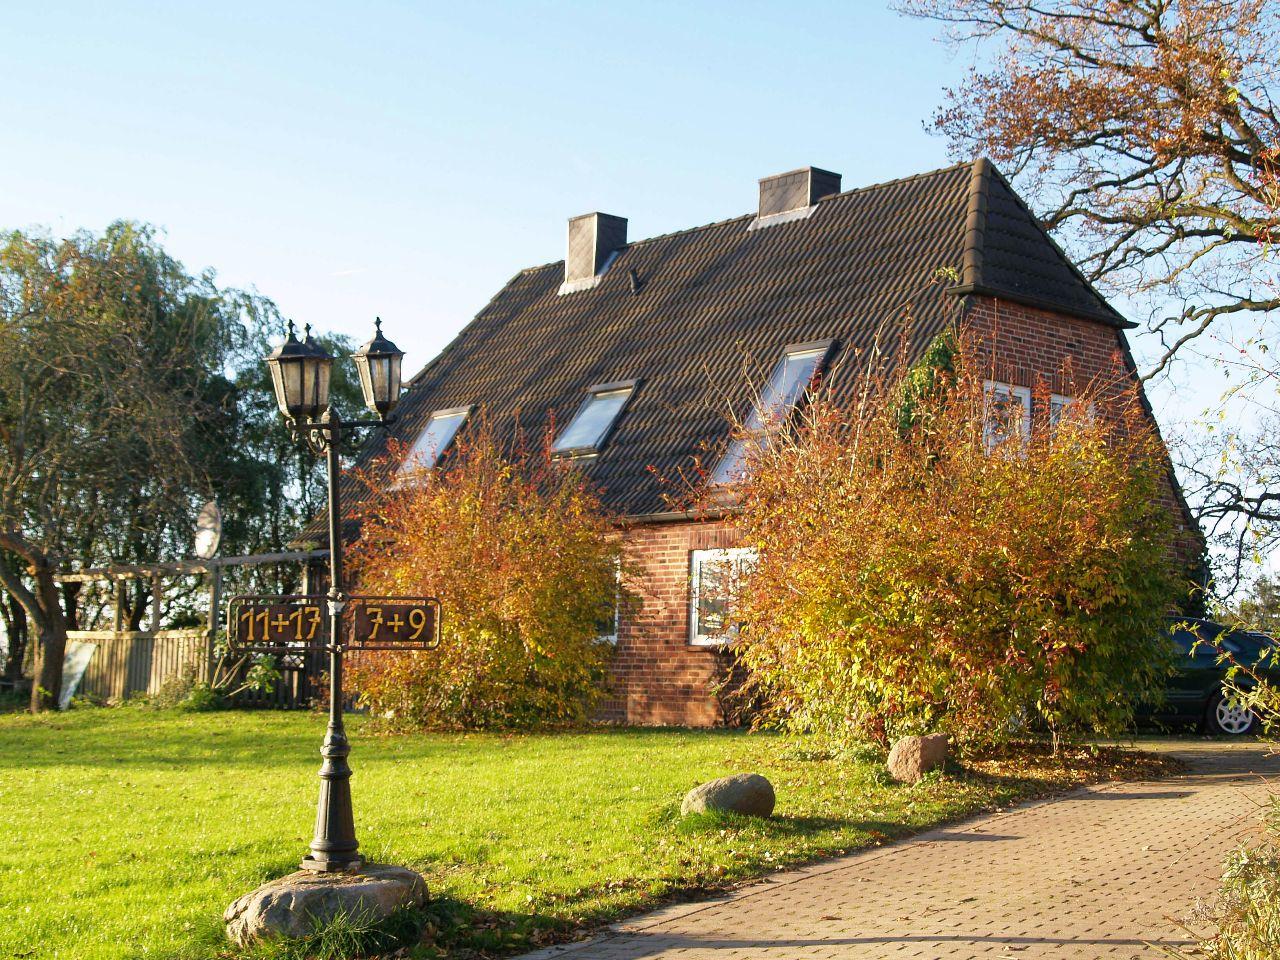 Bundhorst Nr. 7